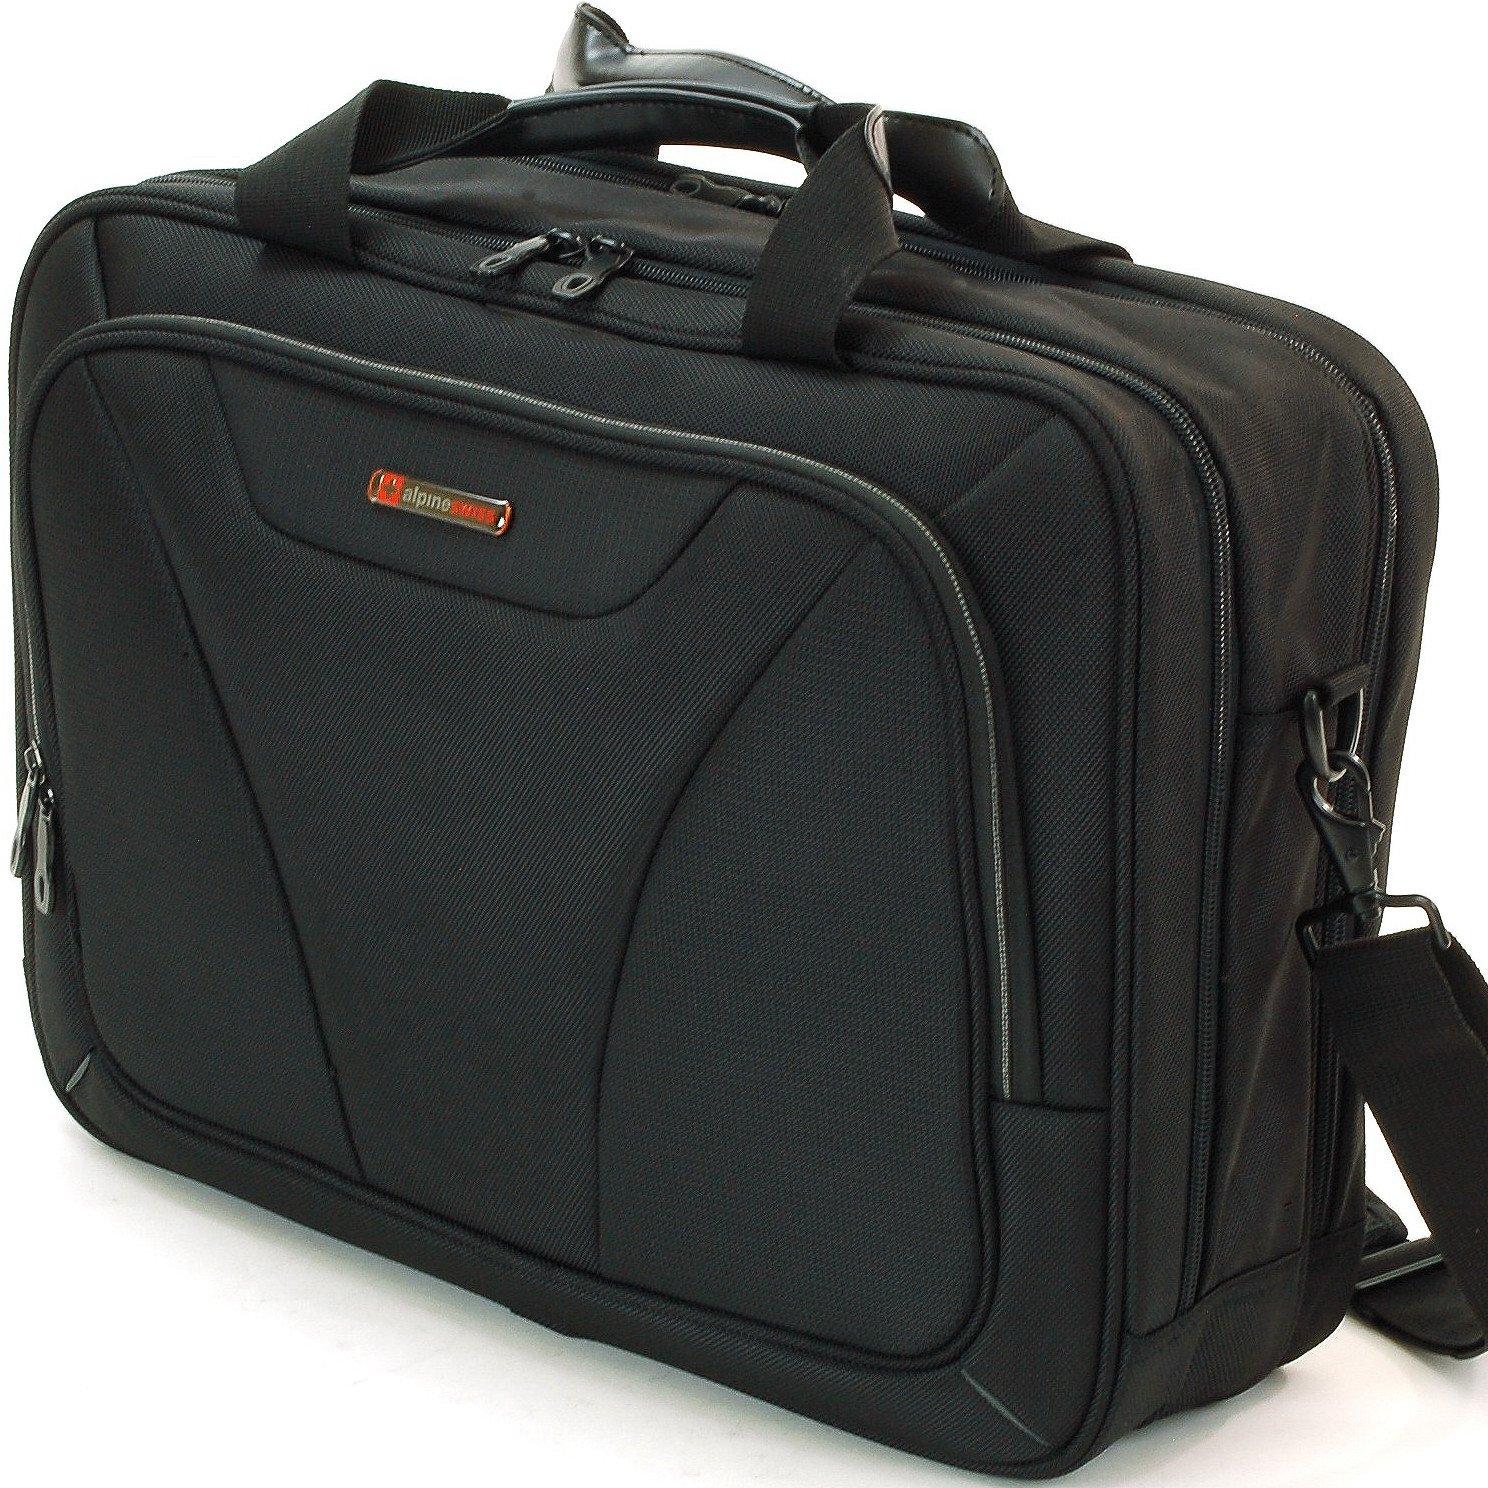 "Alpine Swiss Cortland 15.6"" Laptop Bag Organizer Briefcase Black By Alpine Swiss"